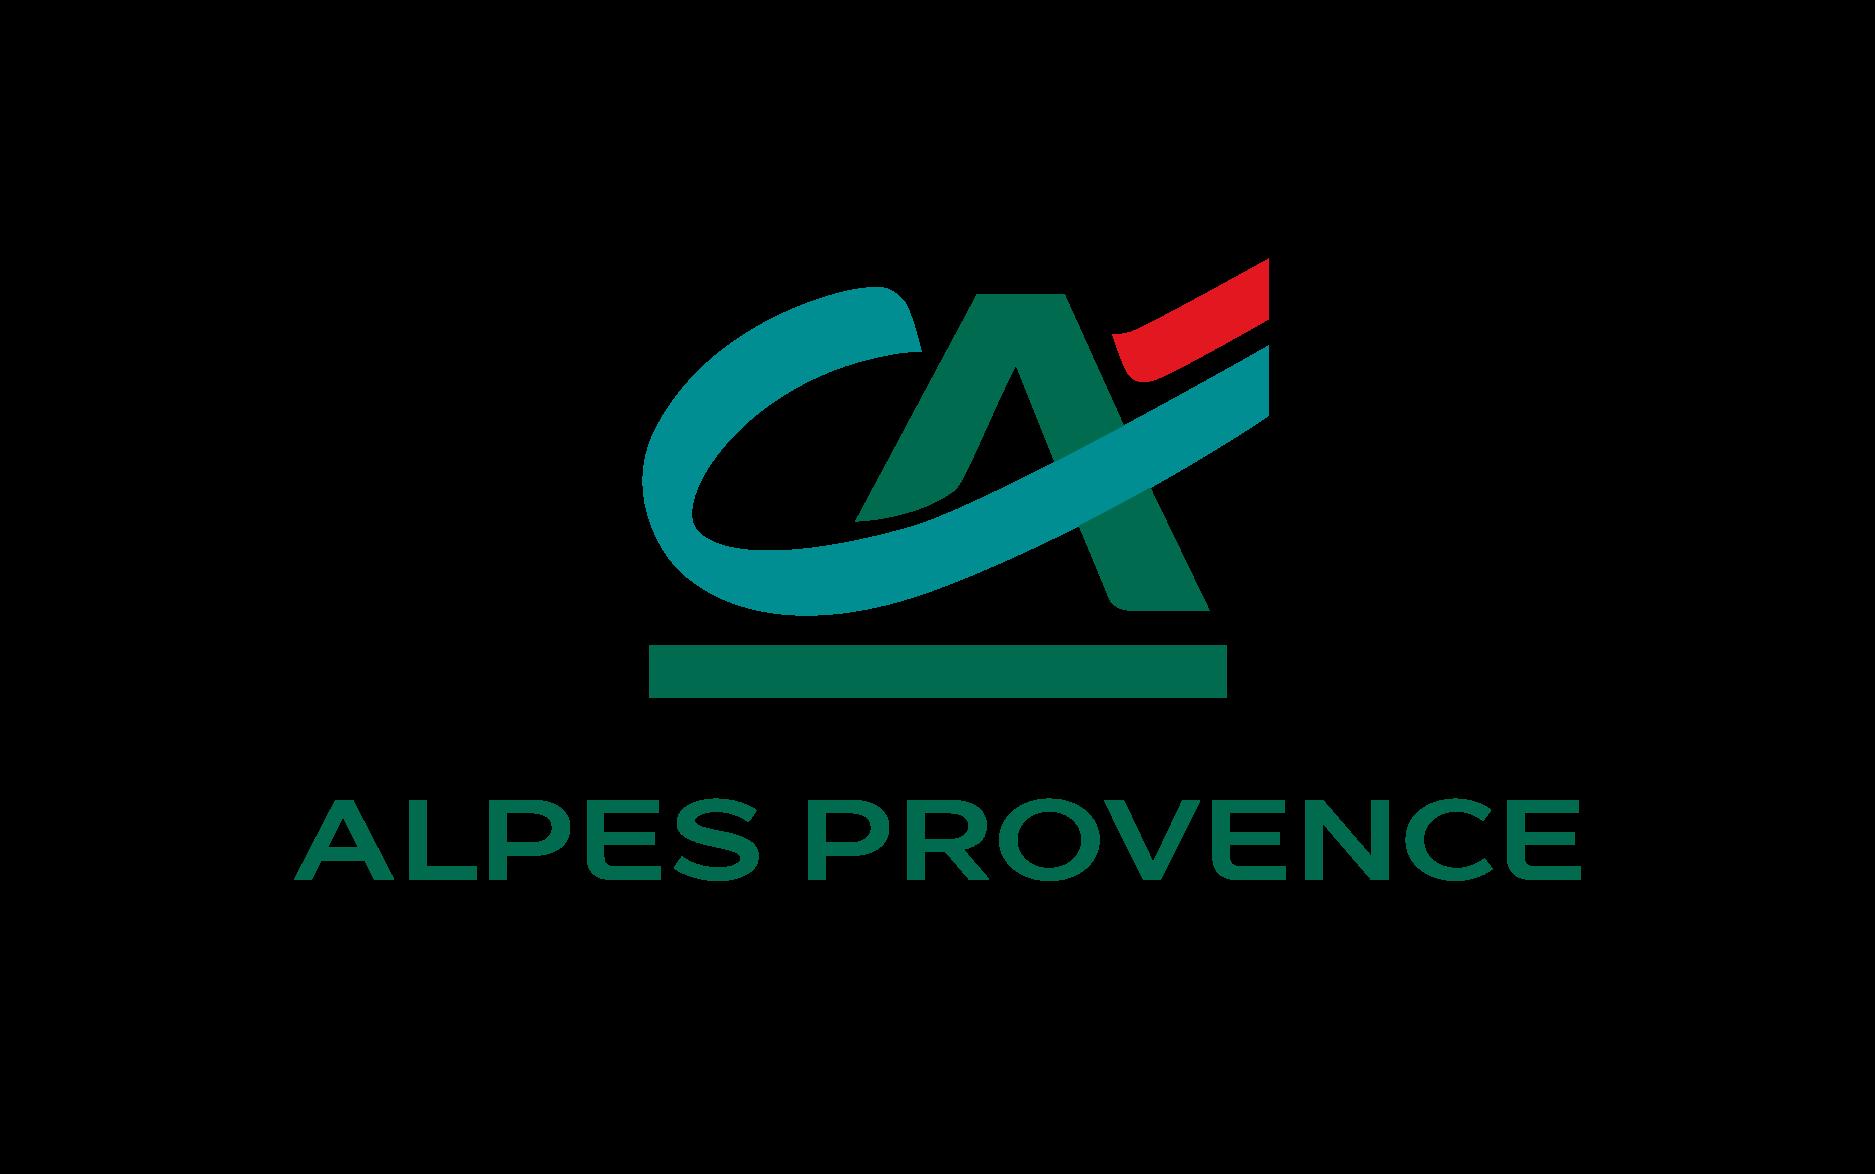 Alpes Provence